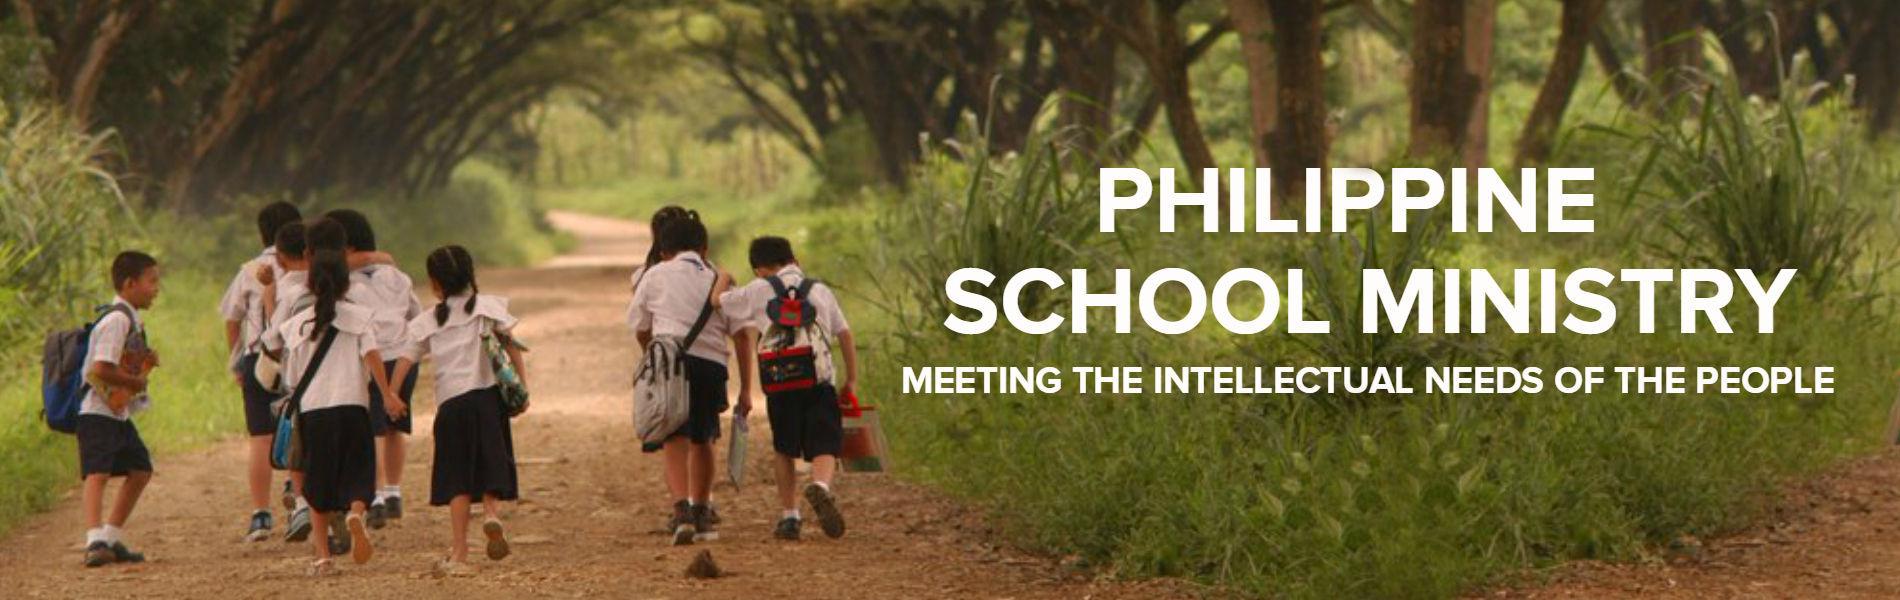 Philippine School Ministry